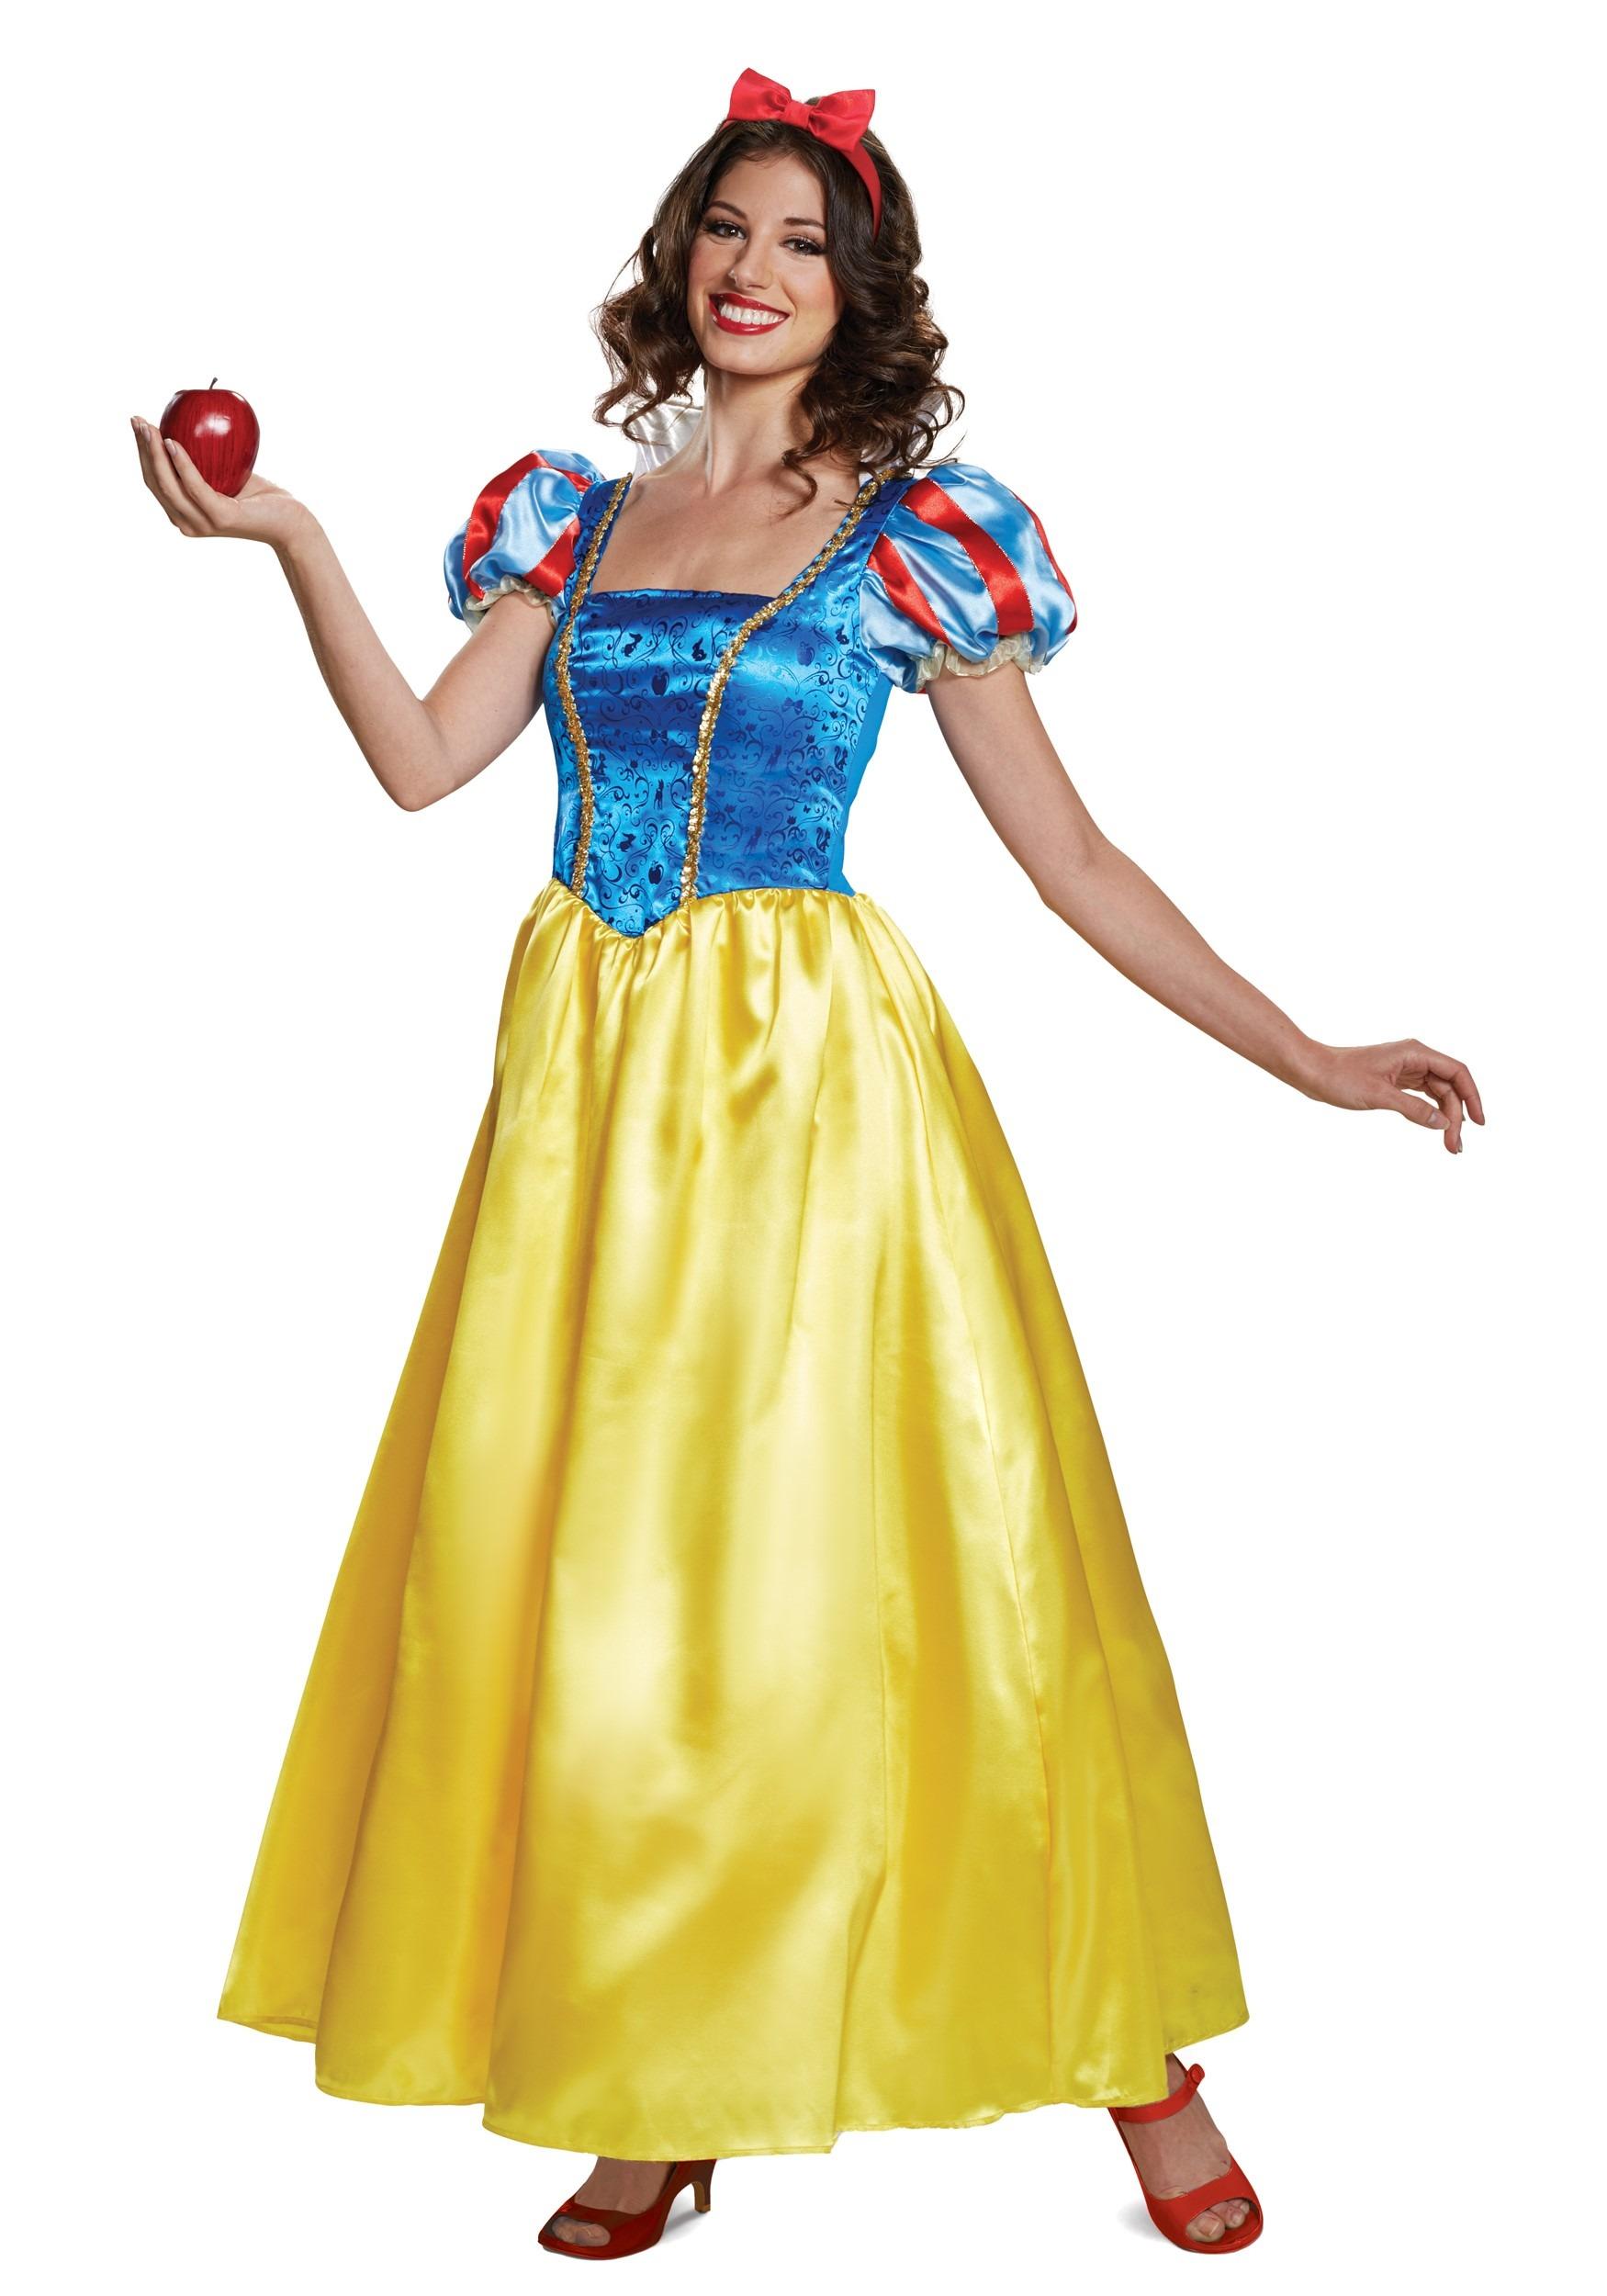 Deluxe Snow White Costume for Women